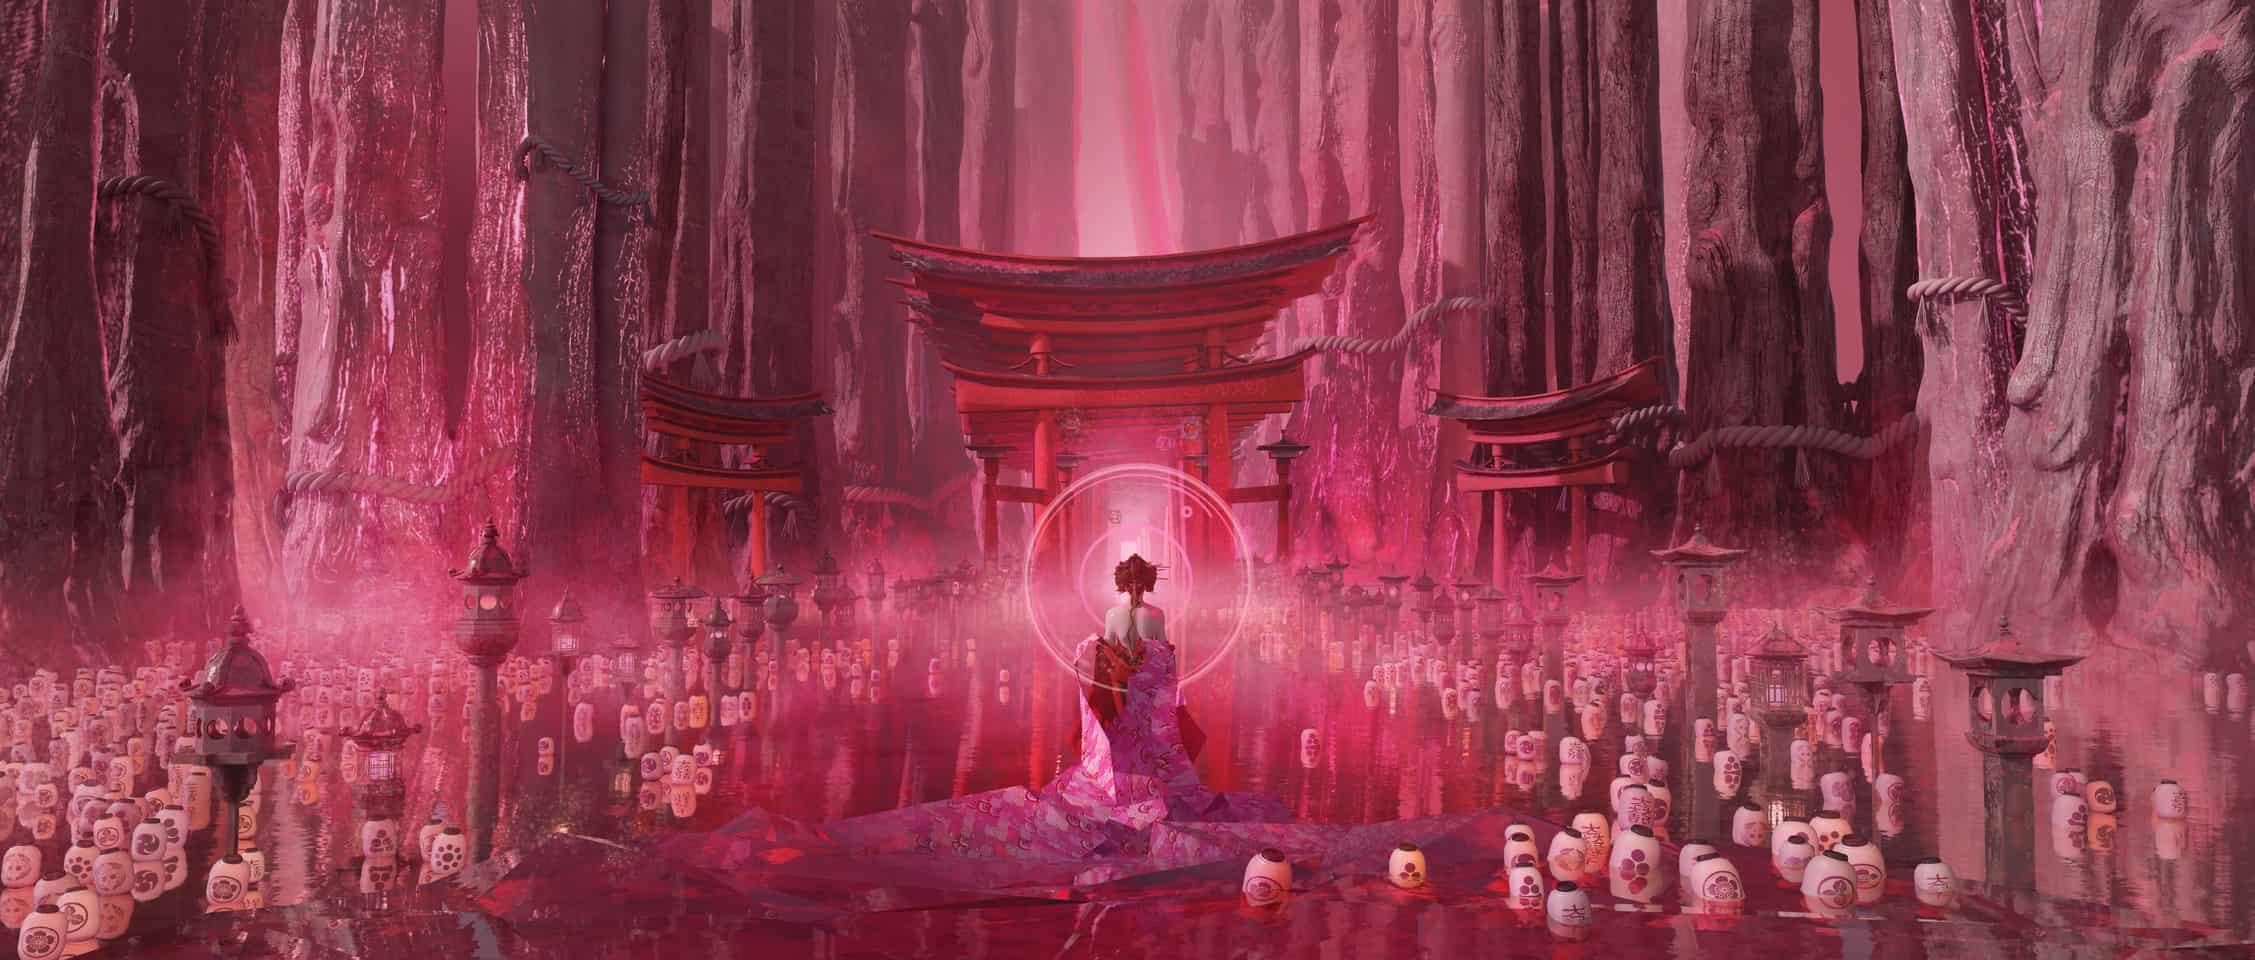 matsuri Illust of huteford Kyoto_Award2020_illustration torii kimono 이뻐요ㅜ 진짜 헐